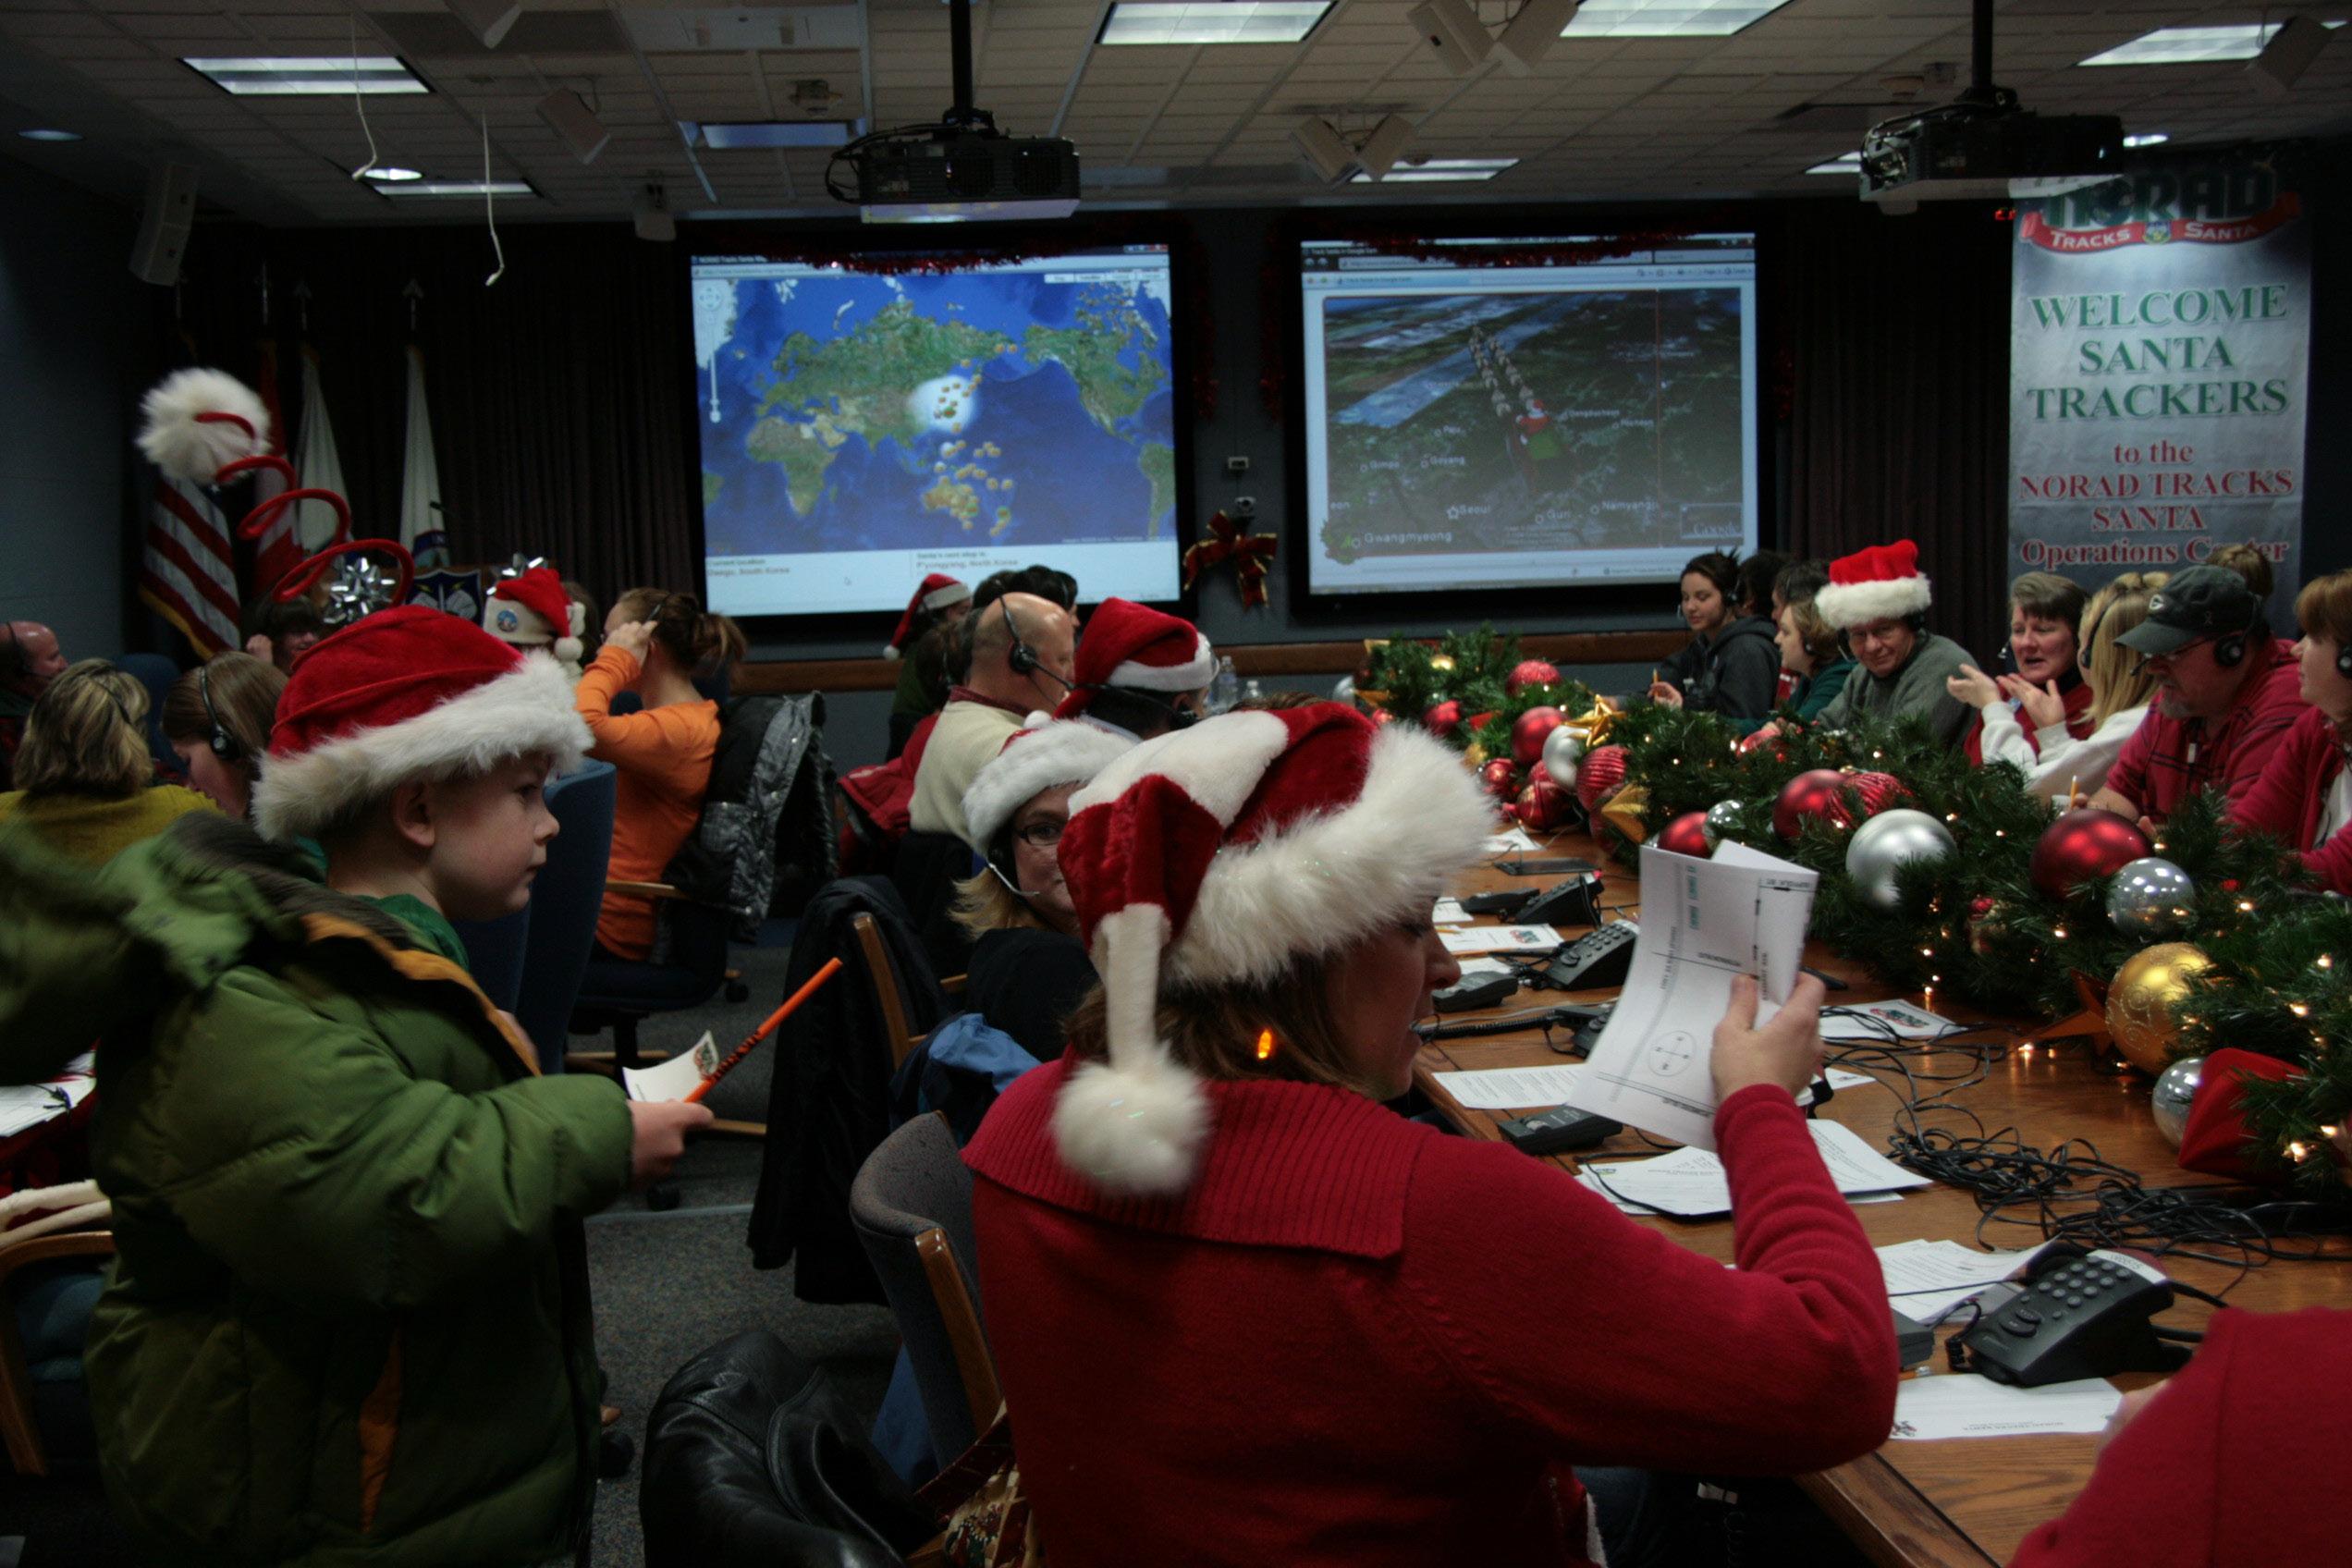 File:NORAD tracks Santa DVIDS234576.jpg - Wikimedia Commons